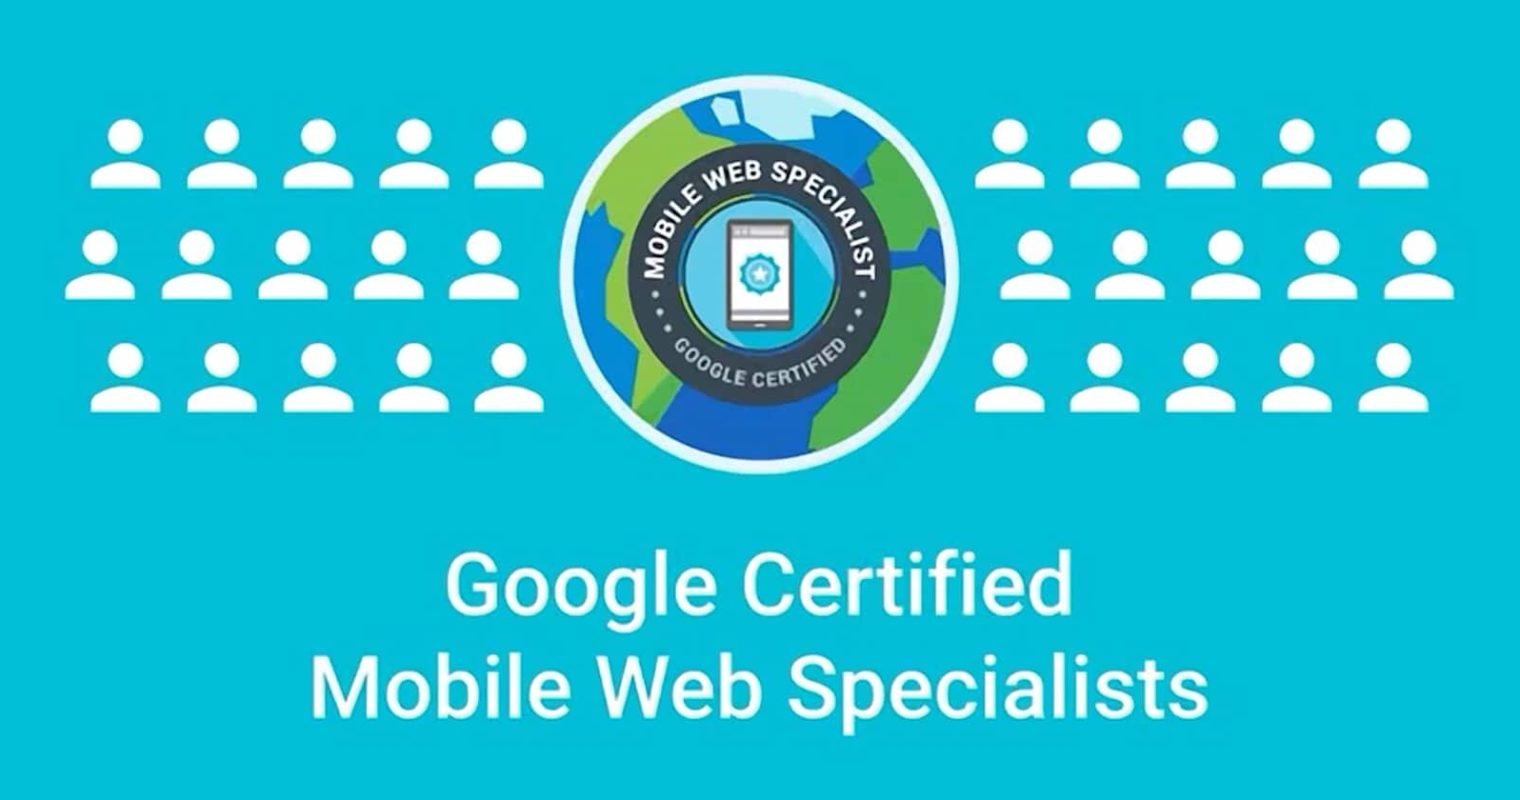 Google is Offering a Mobile Web Developer Certification for $99